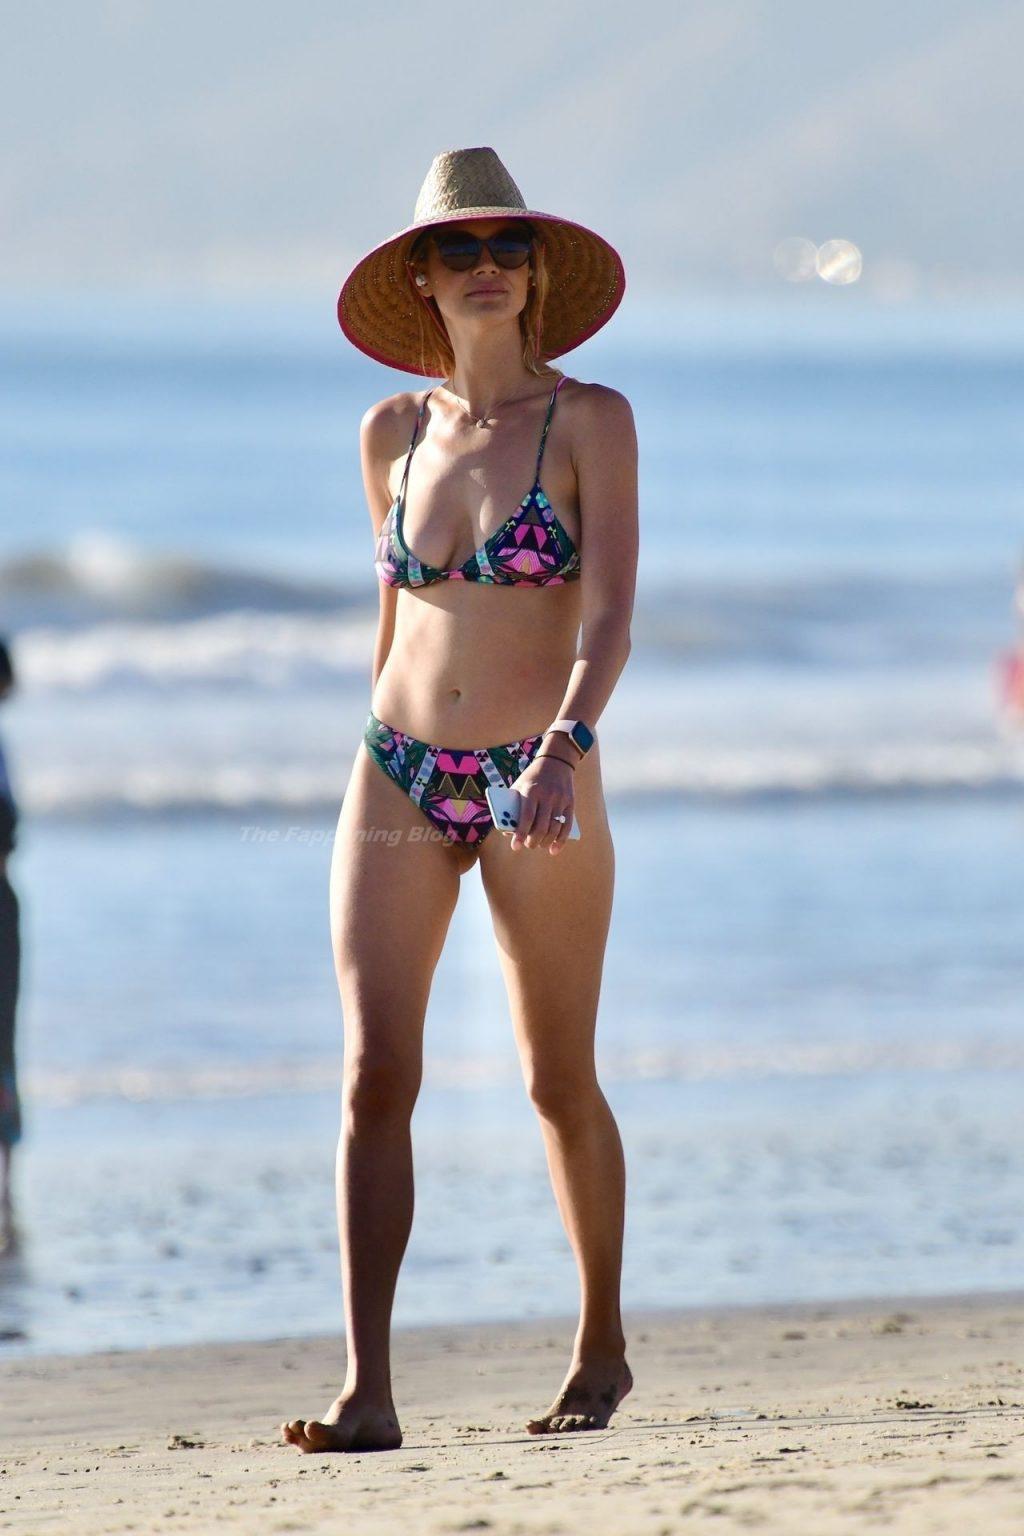 Kelly Rohrbach is Seen Enjoying a Beach Day (77 Photos)